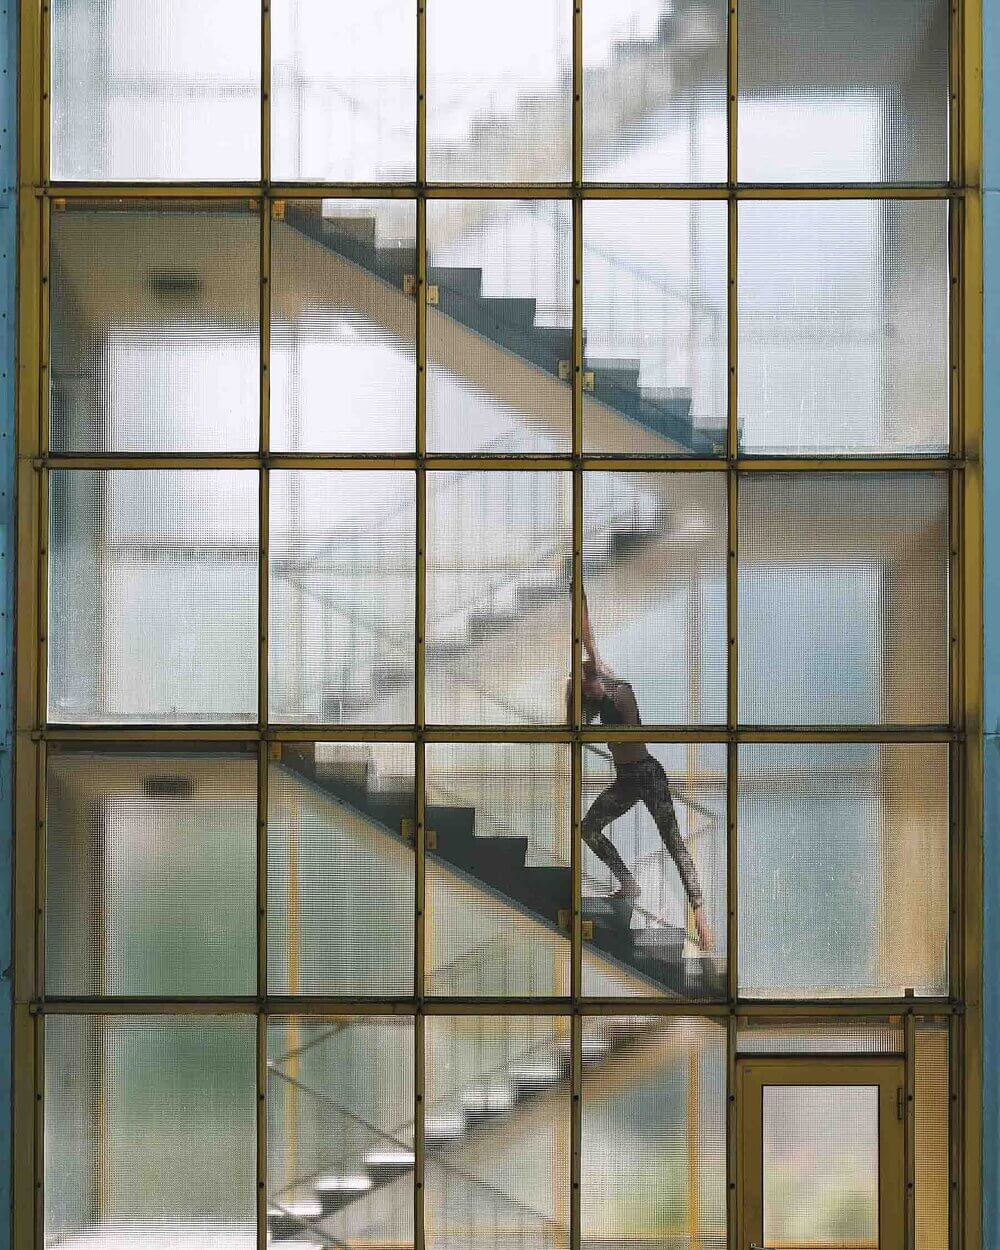 Glass building, minimalist architecture, dance model